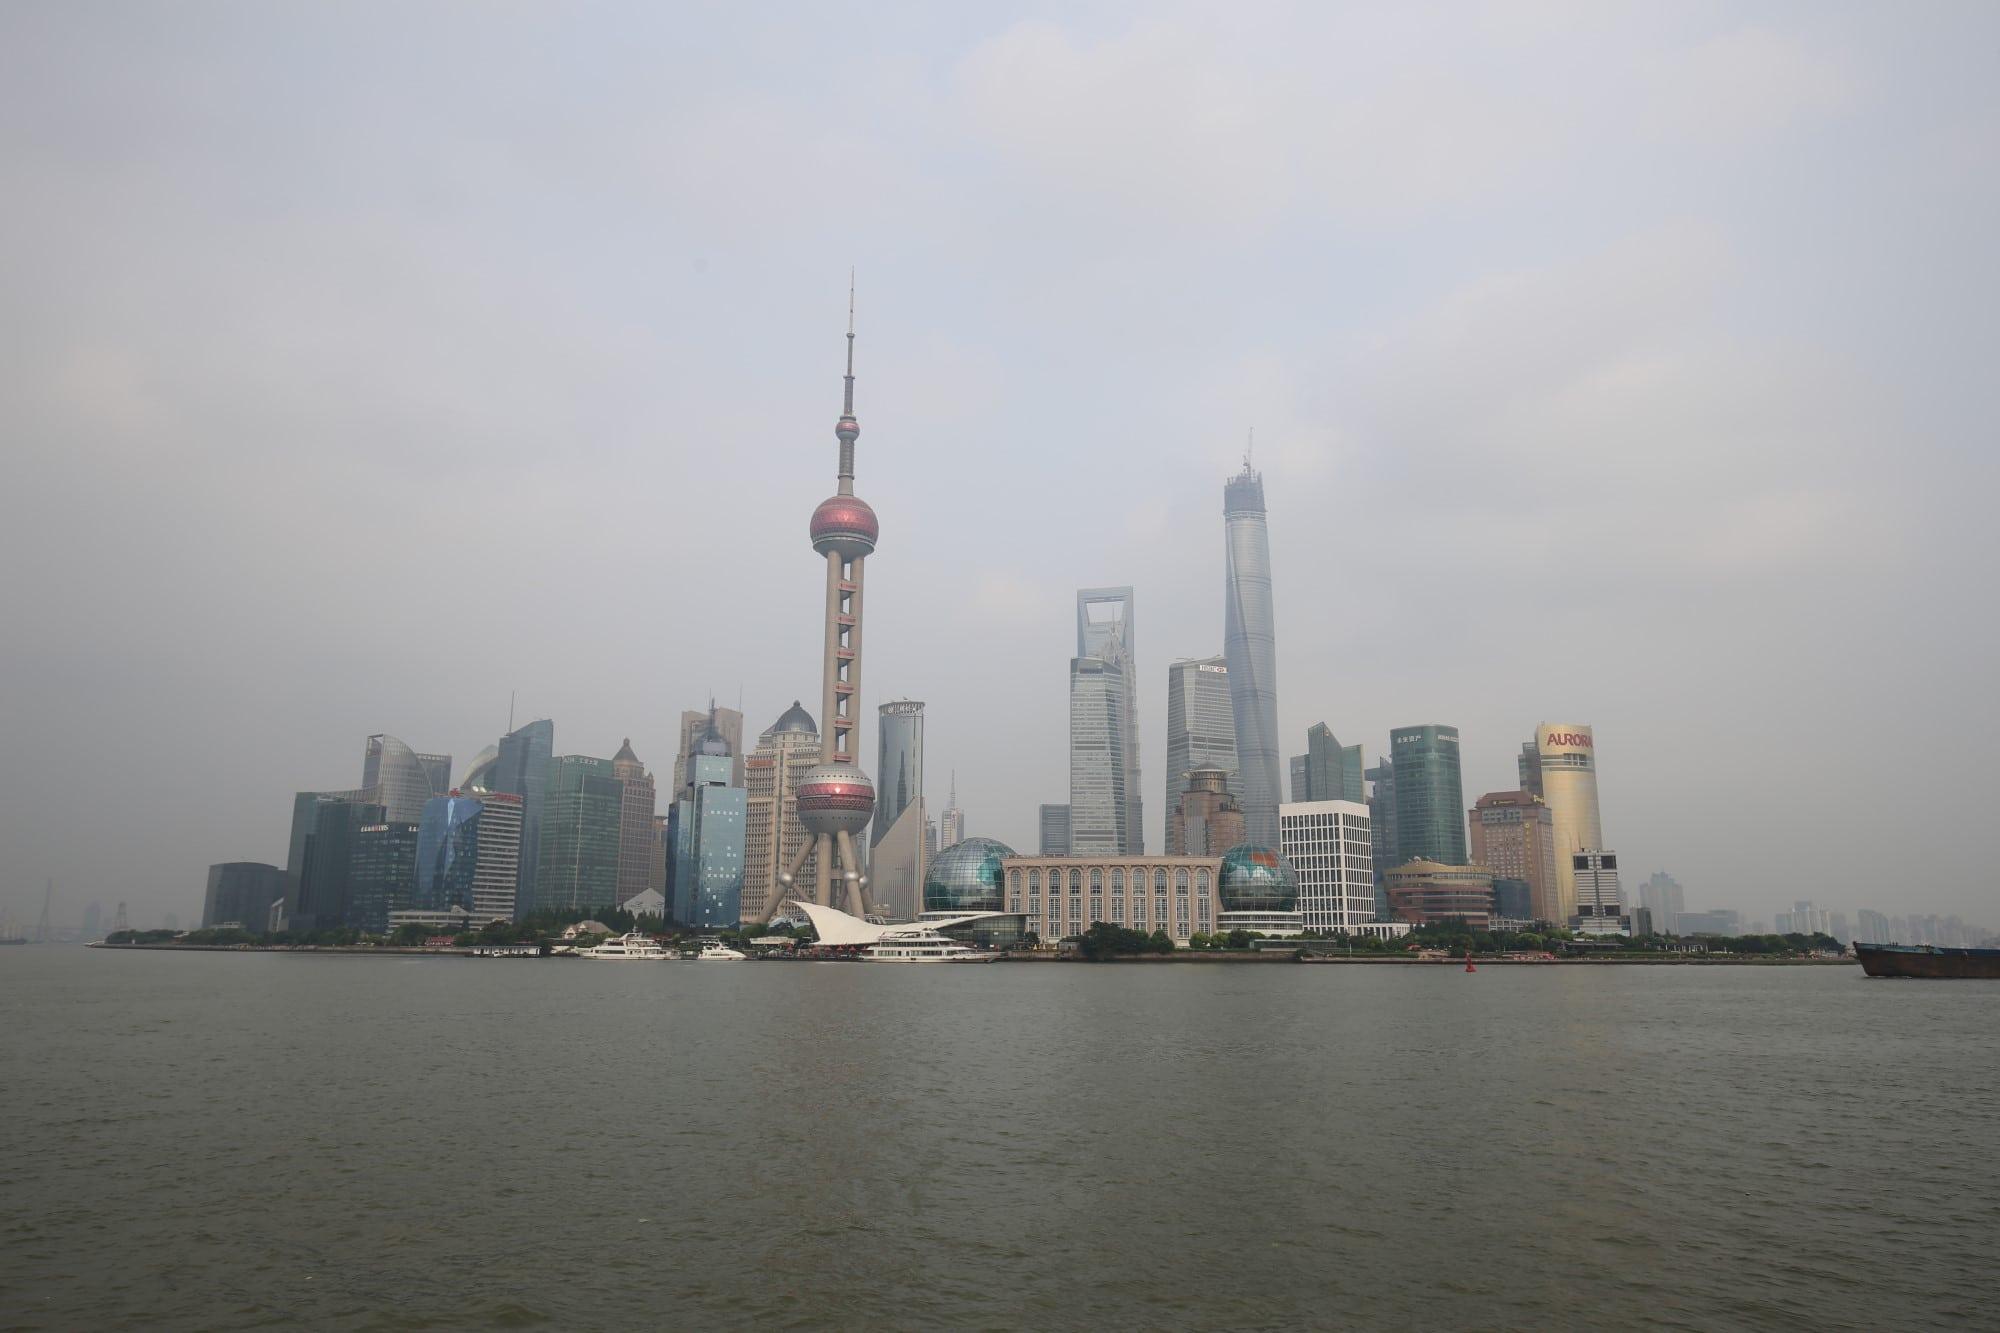 China - Shanghai - the Bund